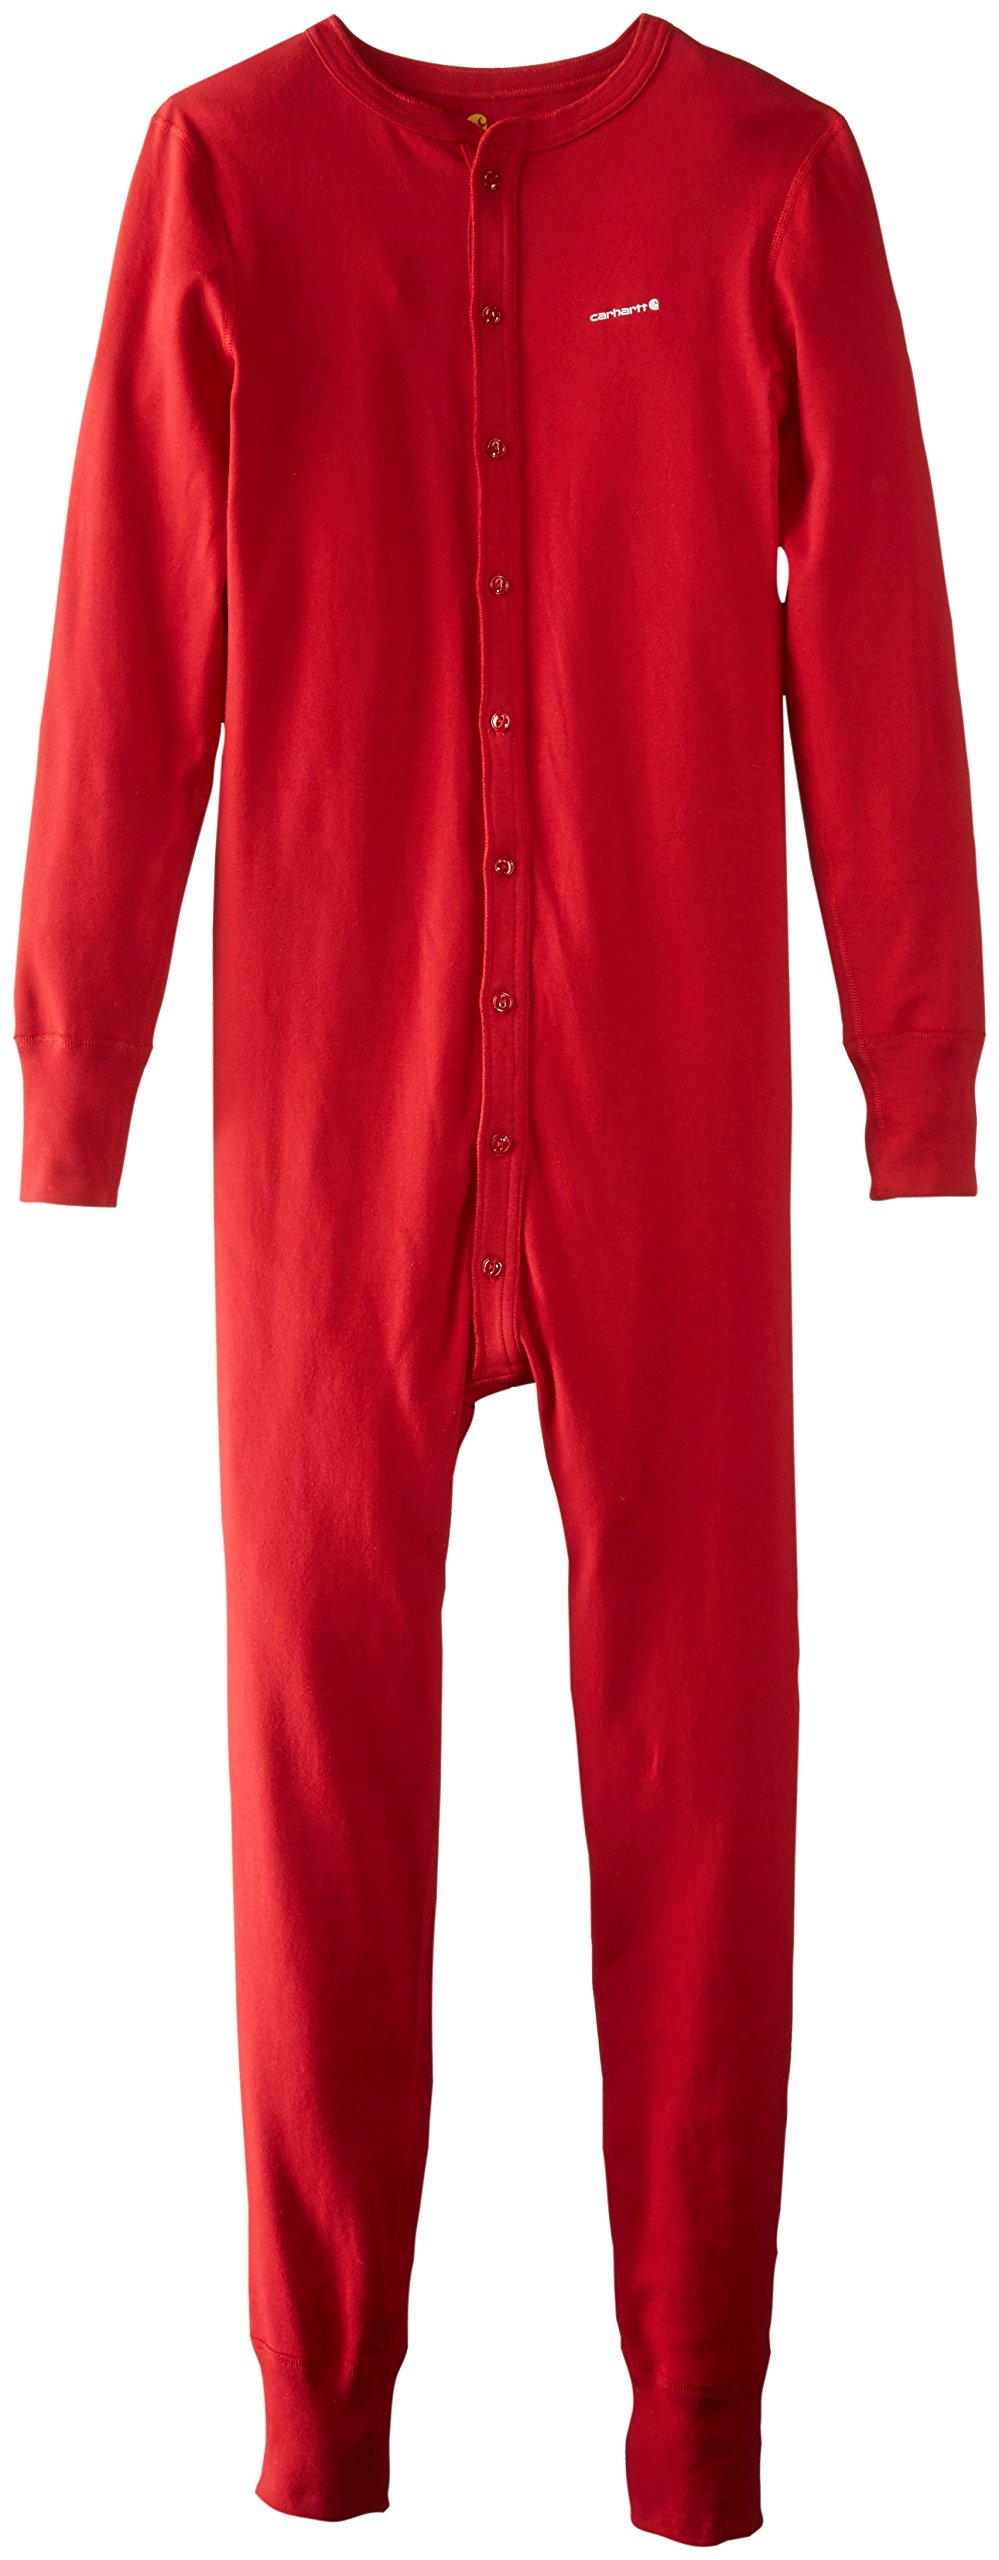 Carhartt Men's Midweight Cotton Union Suit, Red, Medium Regular by Carhartt